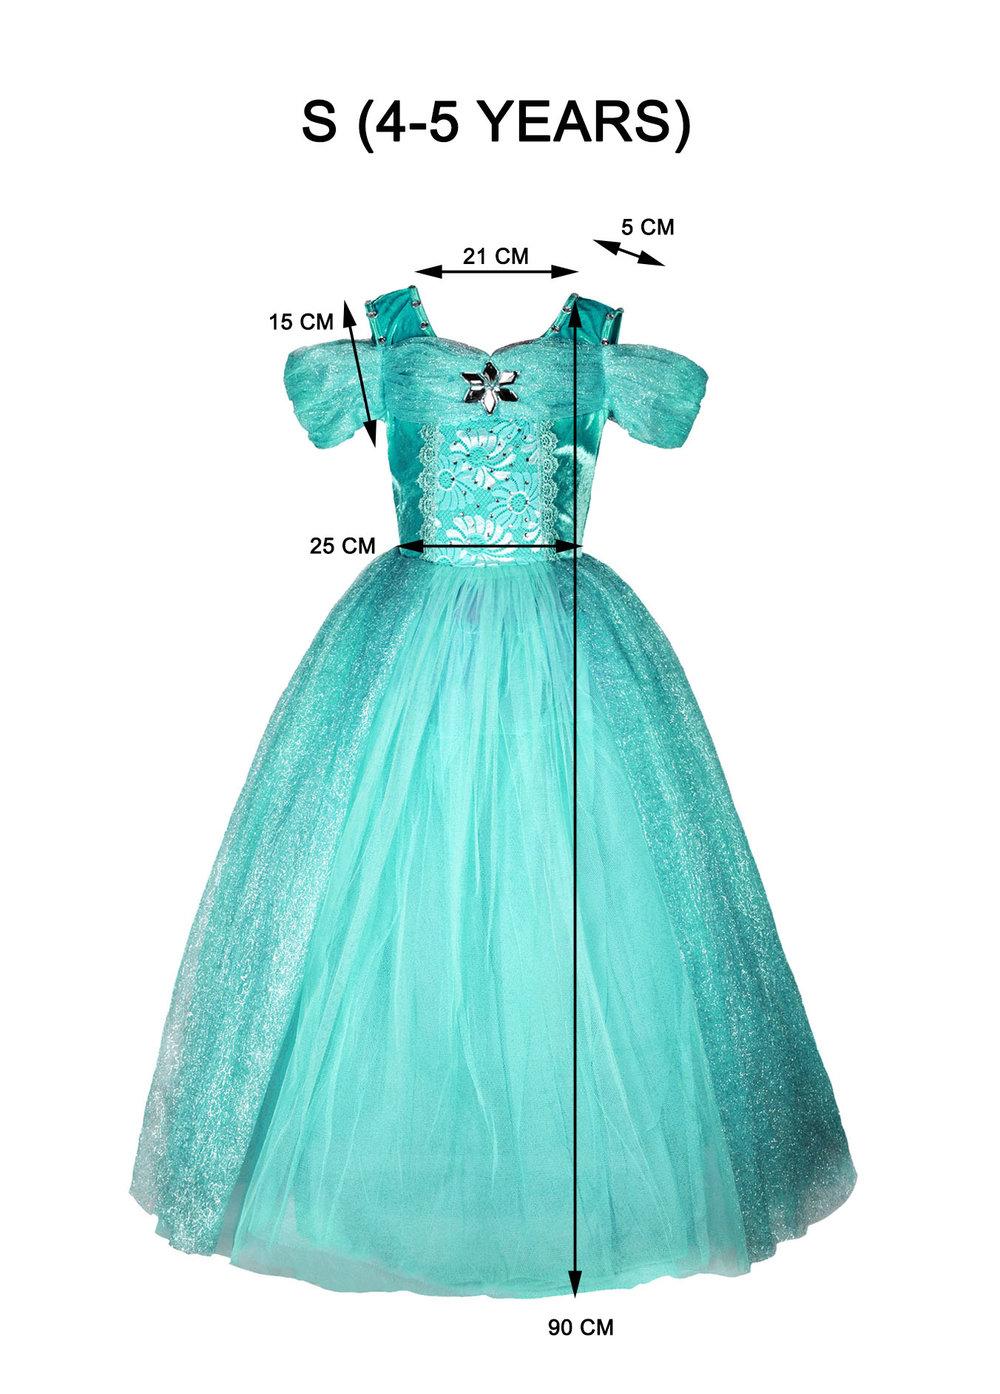 Sparkly Princess Turquoise S.jpg